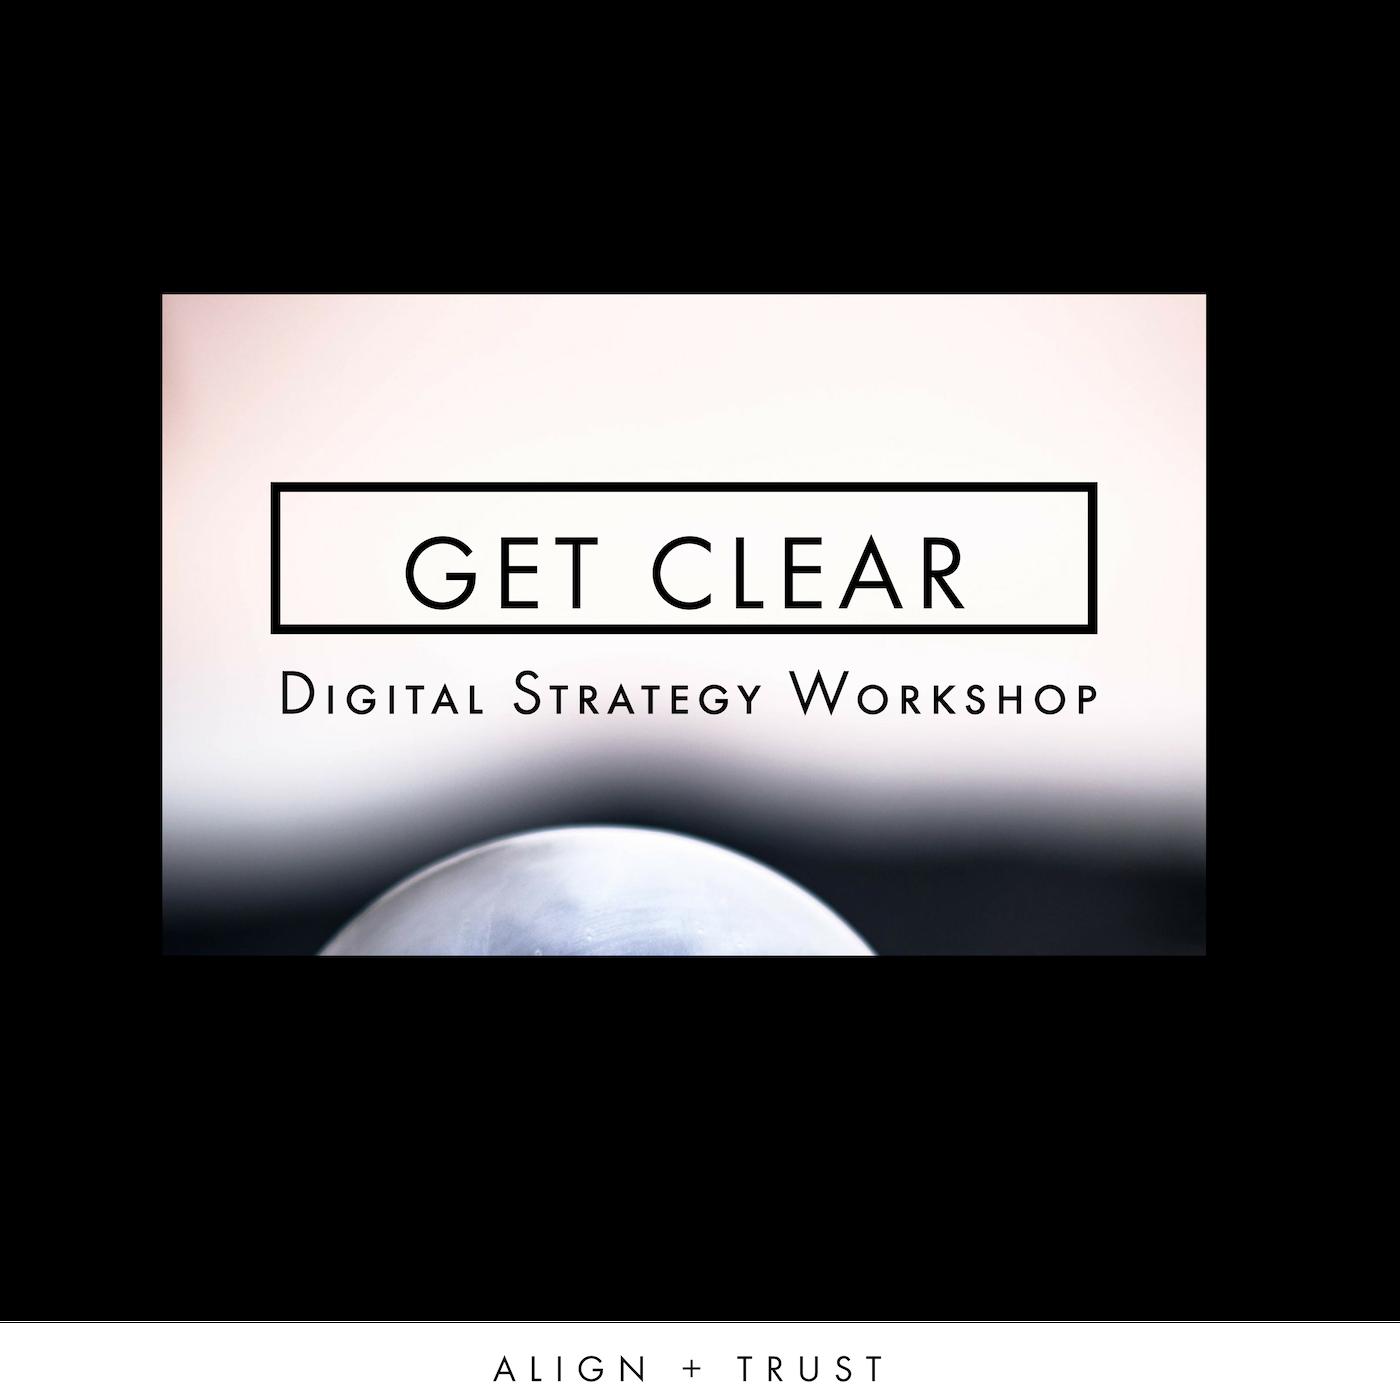 get clear digitial strategy workshop